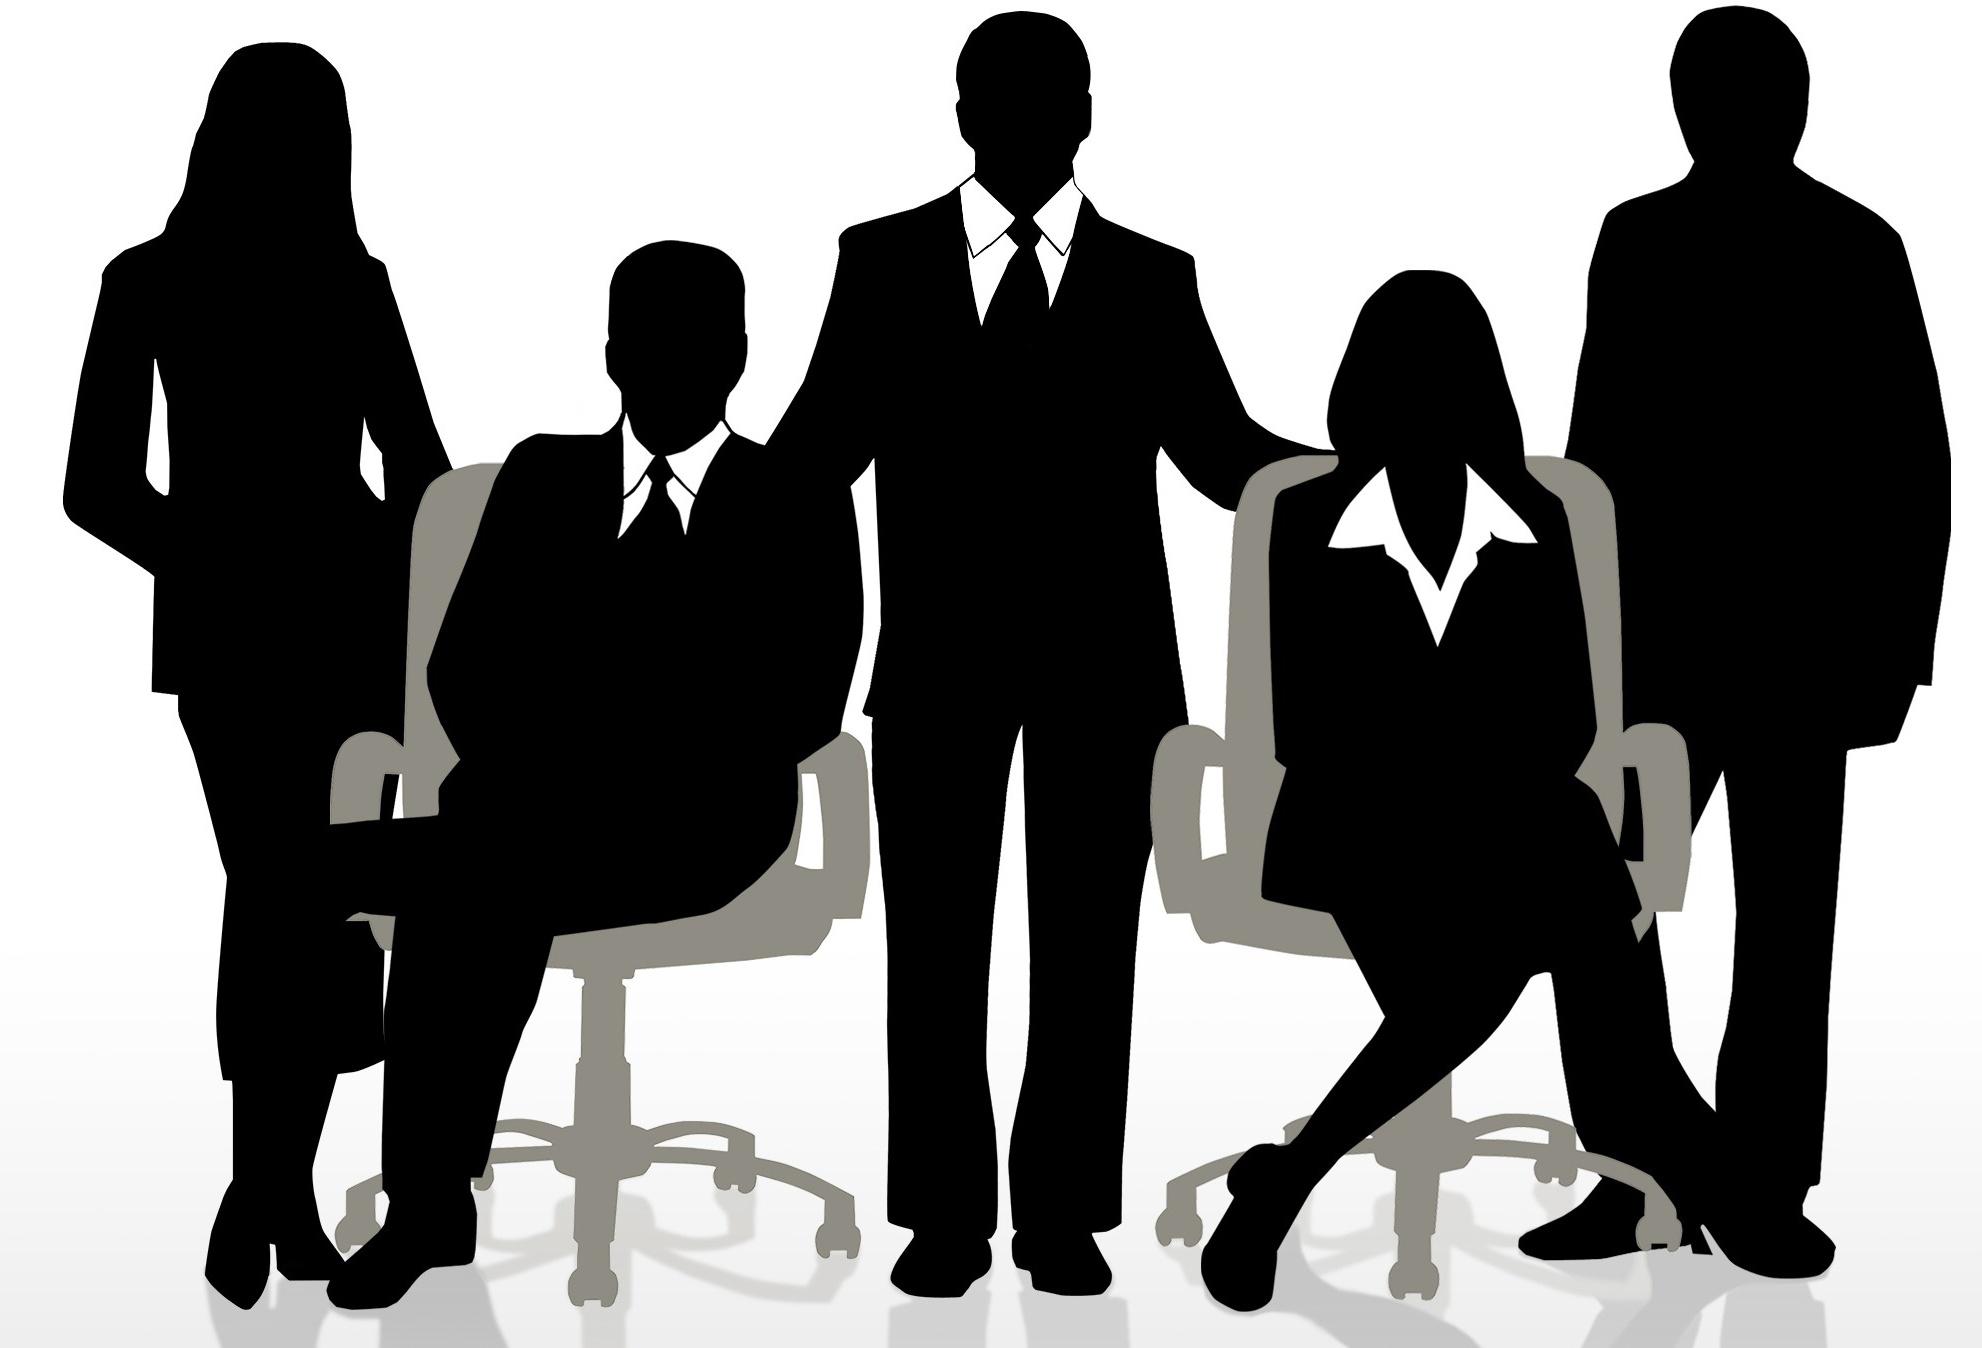 Silhouette-Business-Team-cropped-long-e1301081946528.jpg